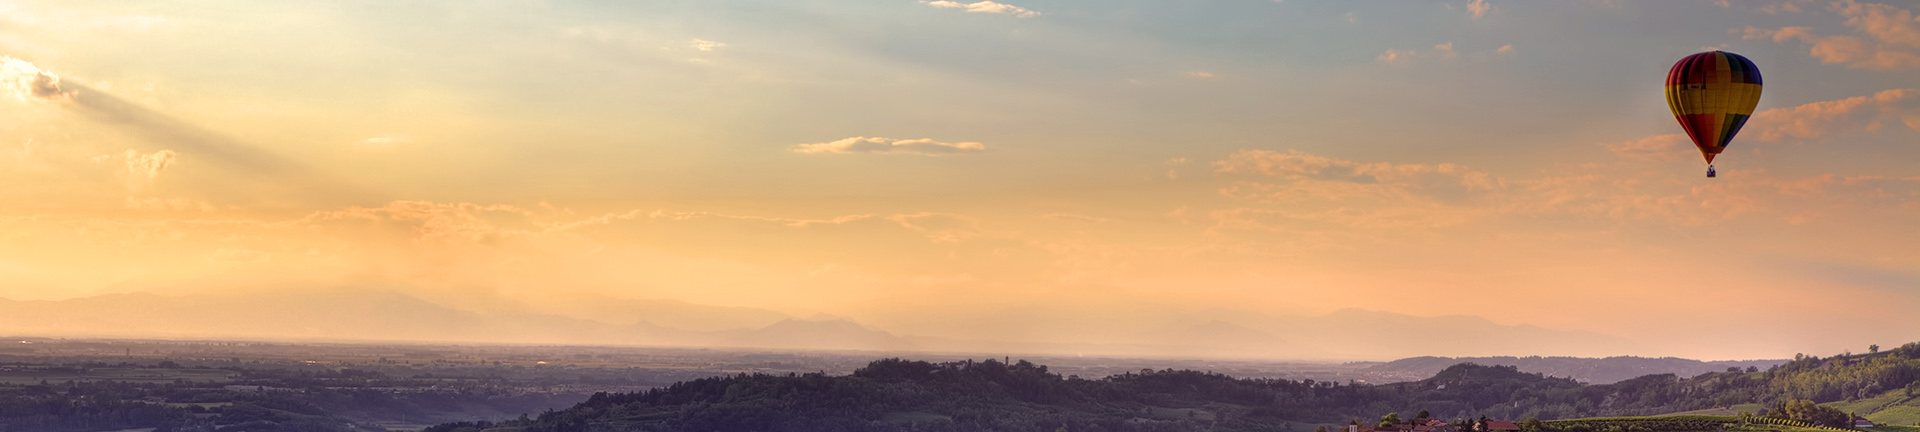 orizzonte-mongolfiera